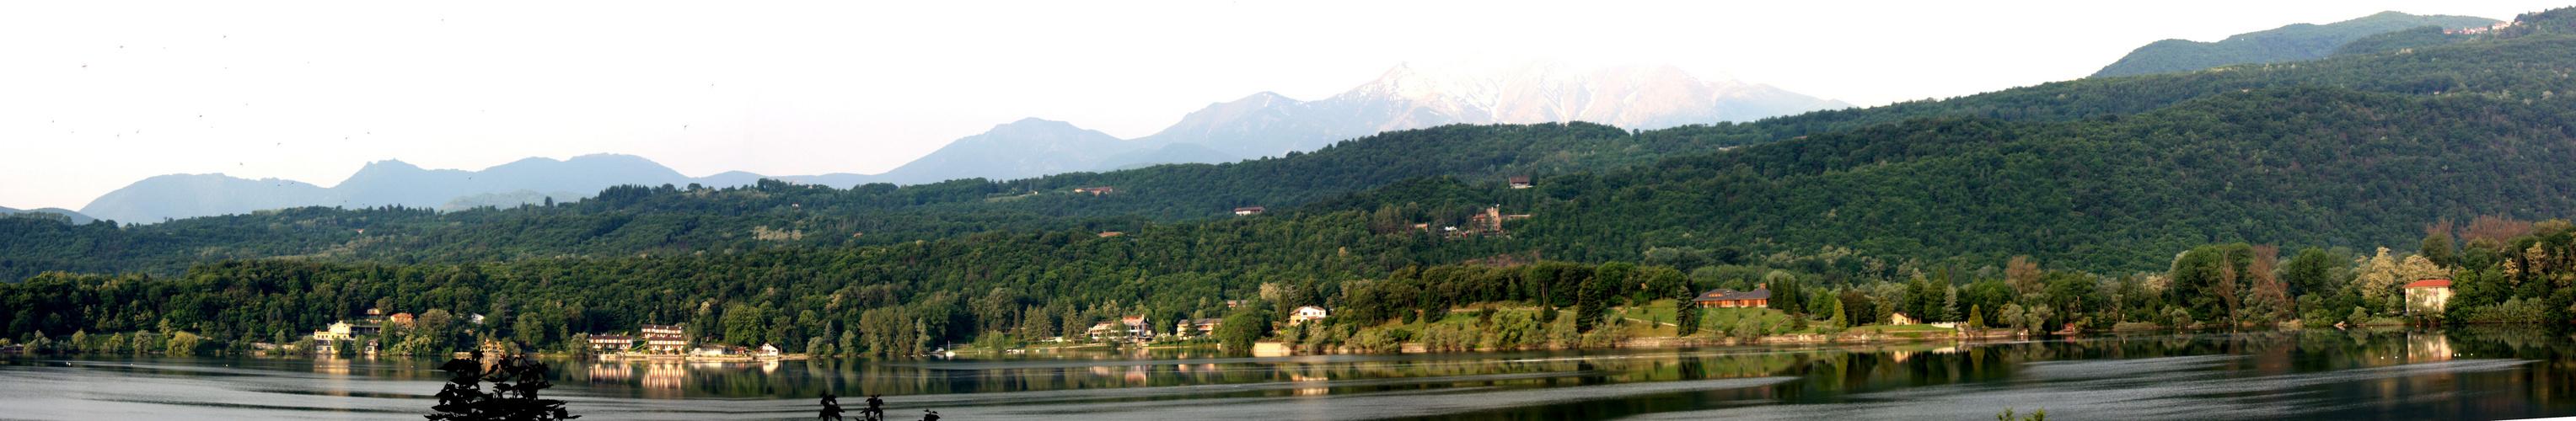 Panorama in Italien